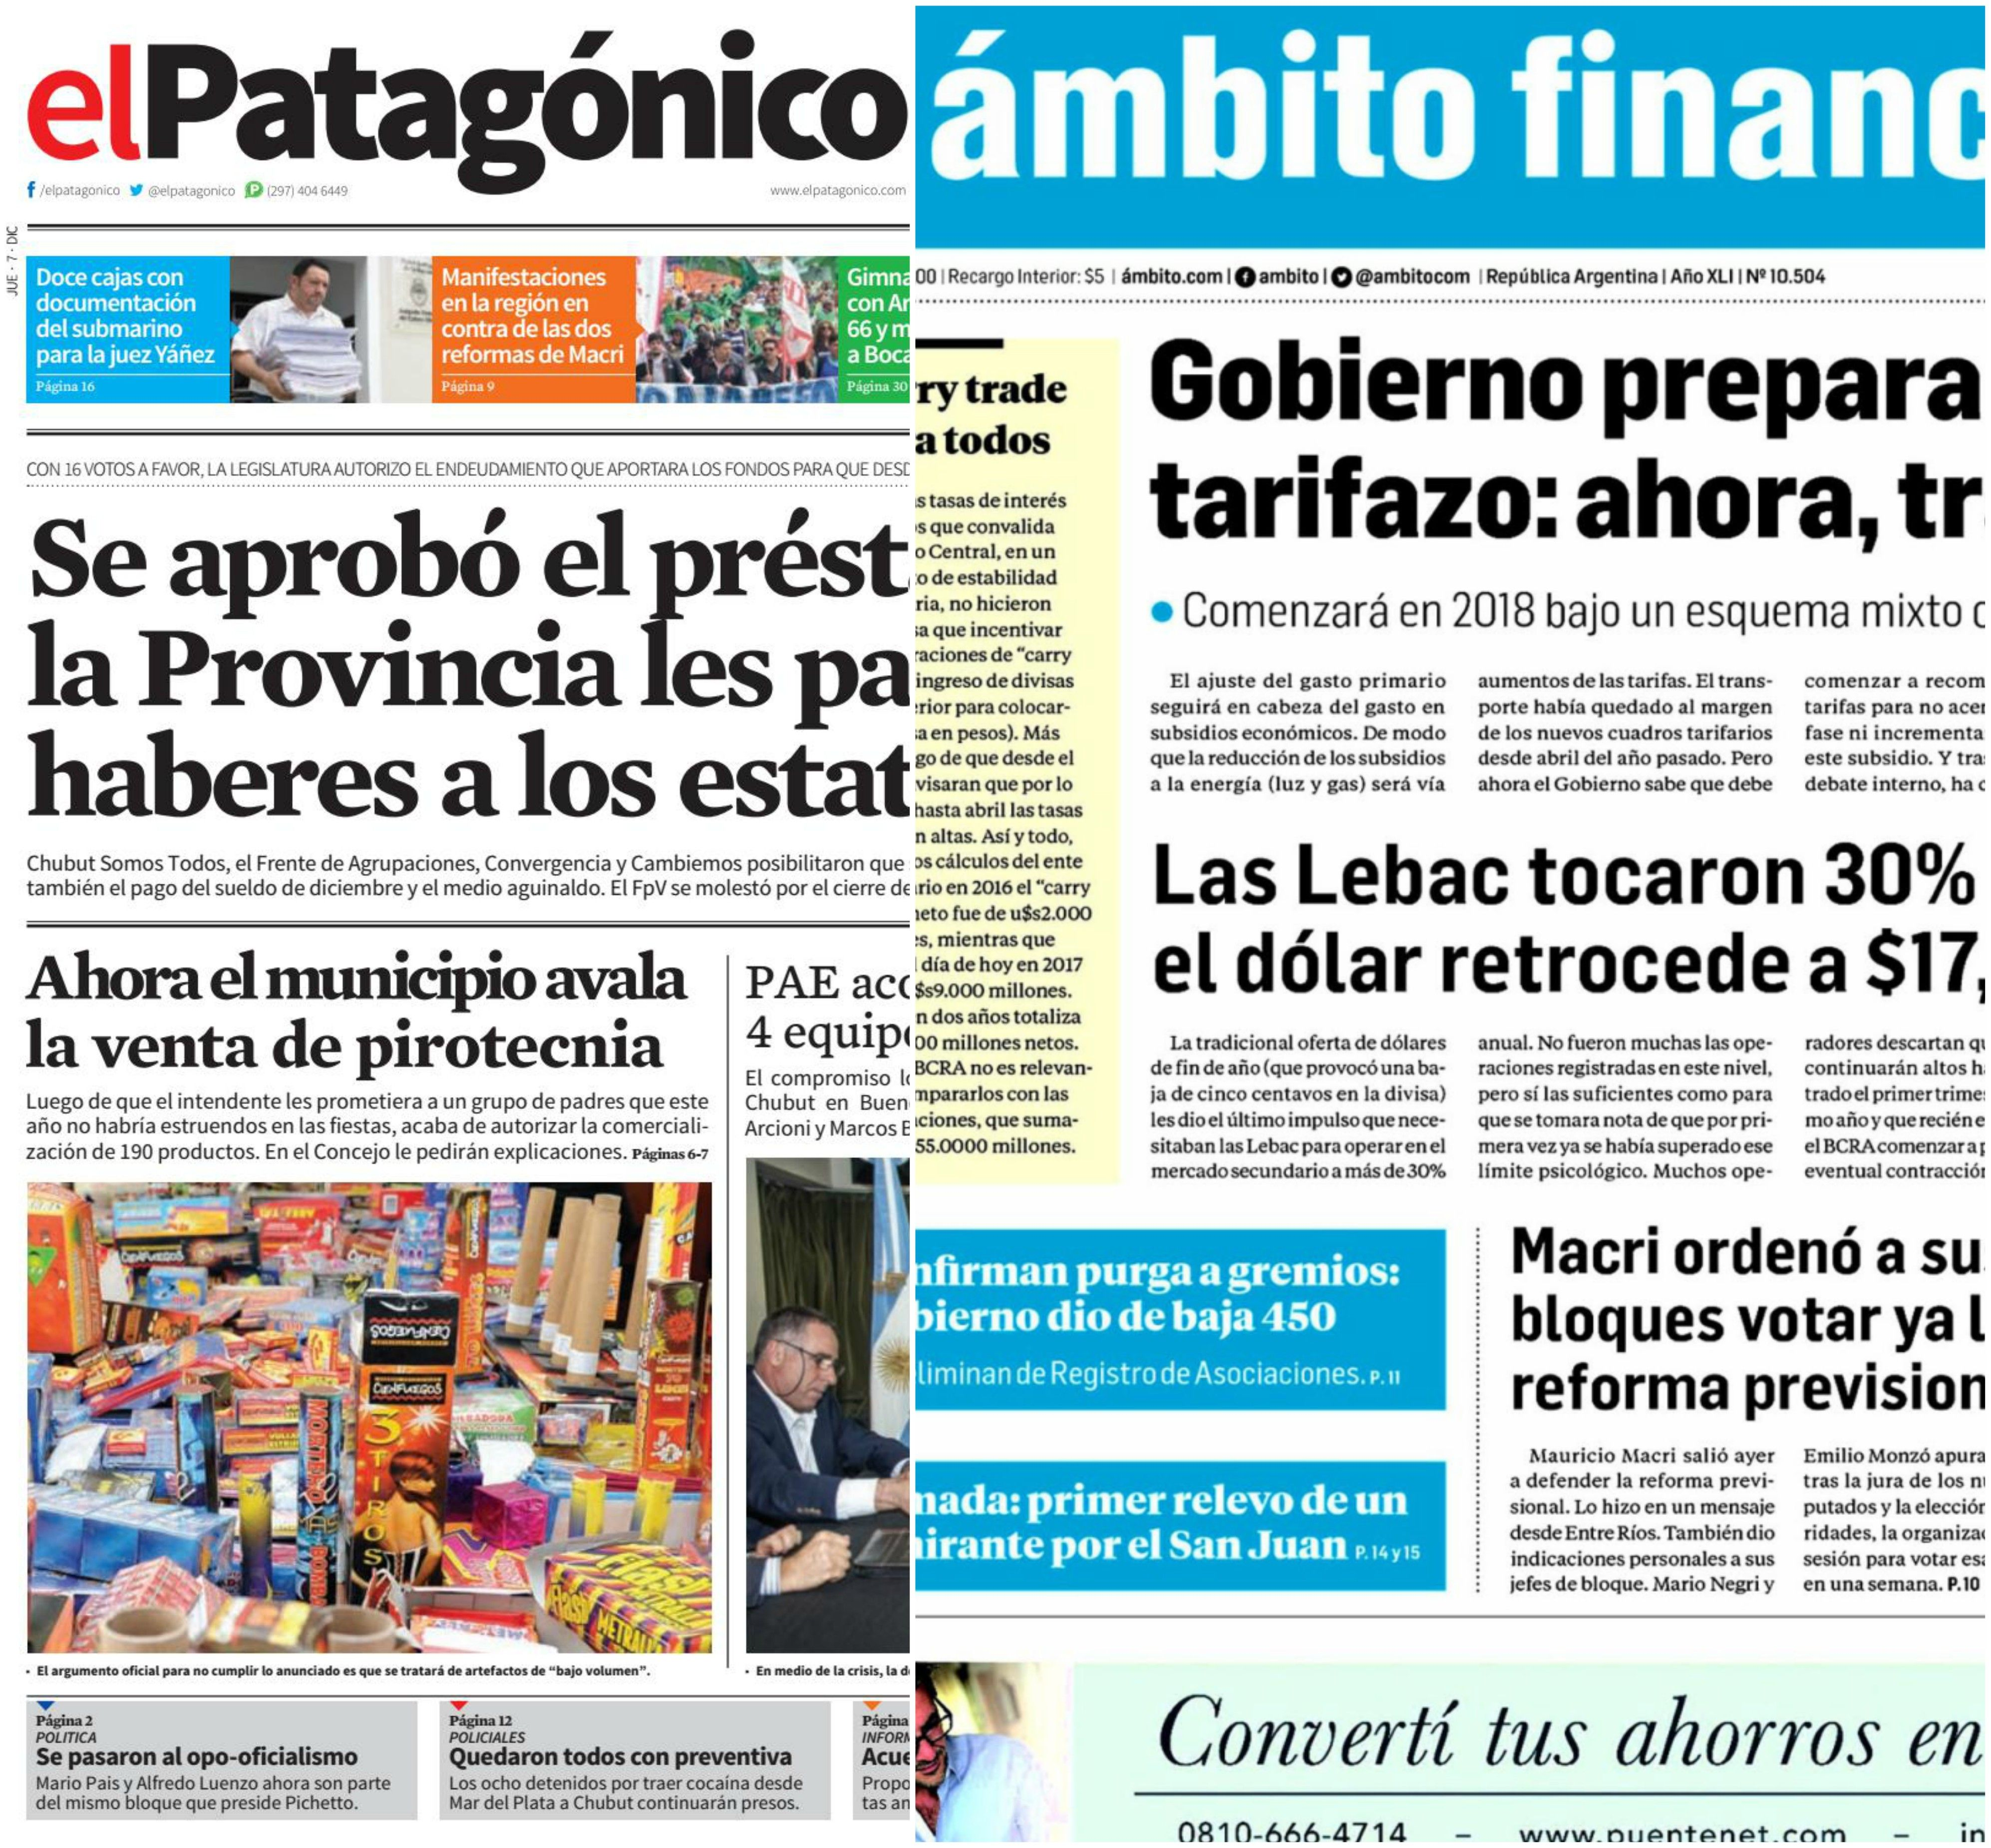 Tapas de diarios del jueves 7 de diciembre de 2017